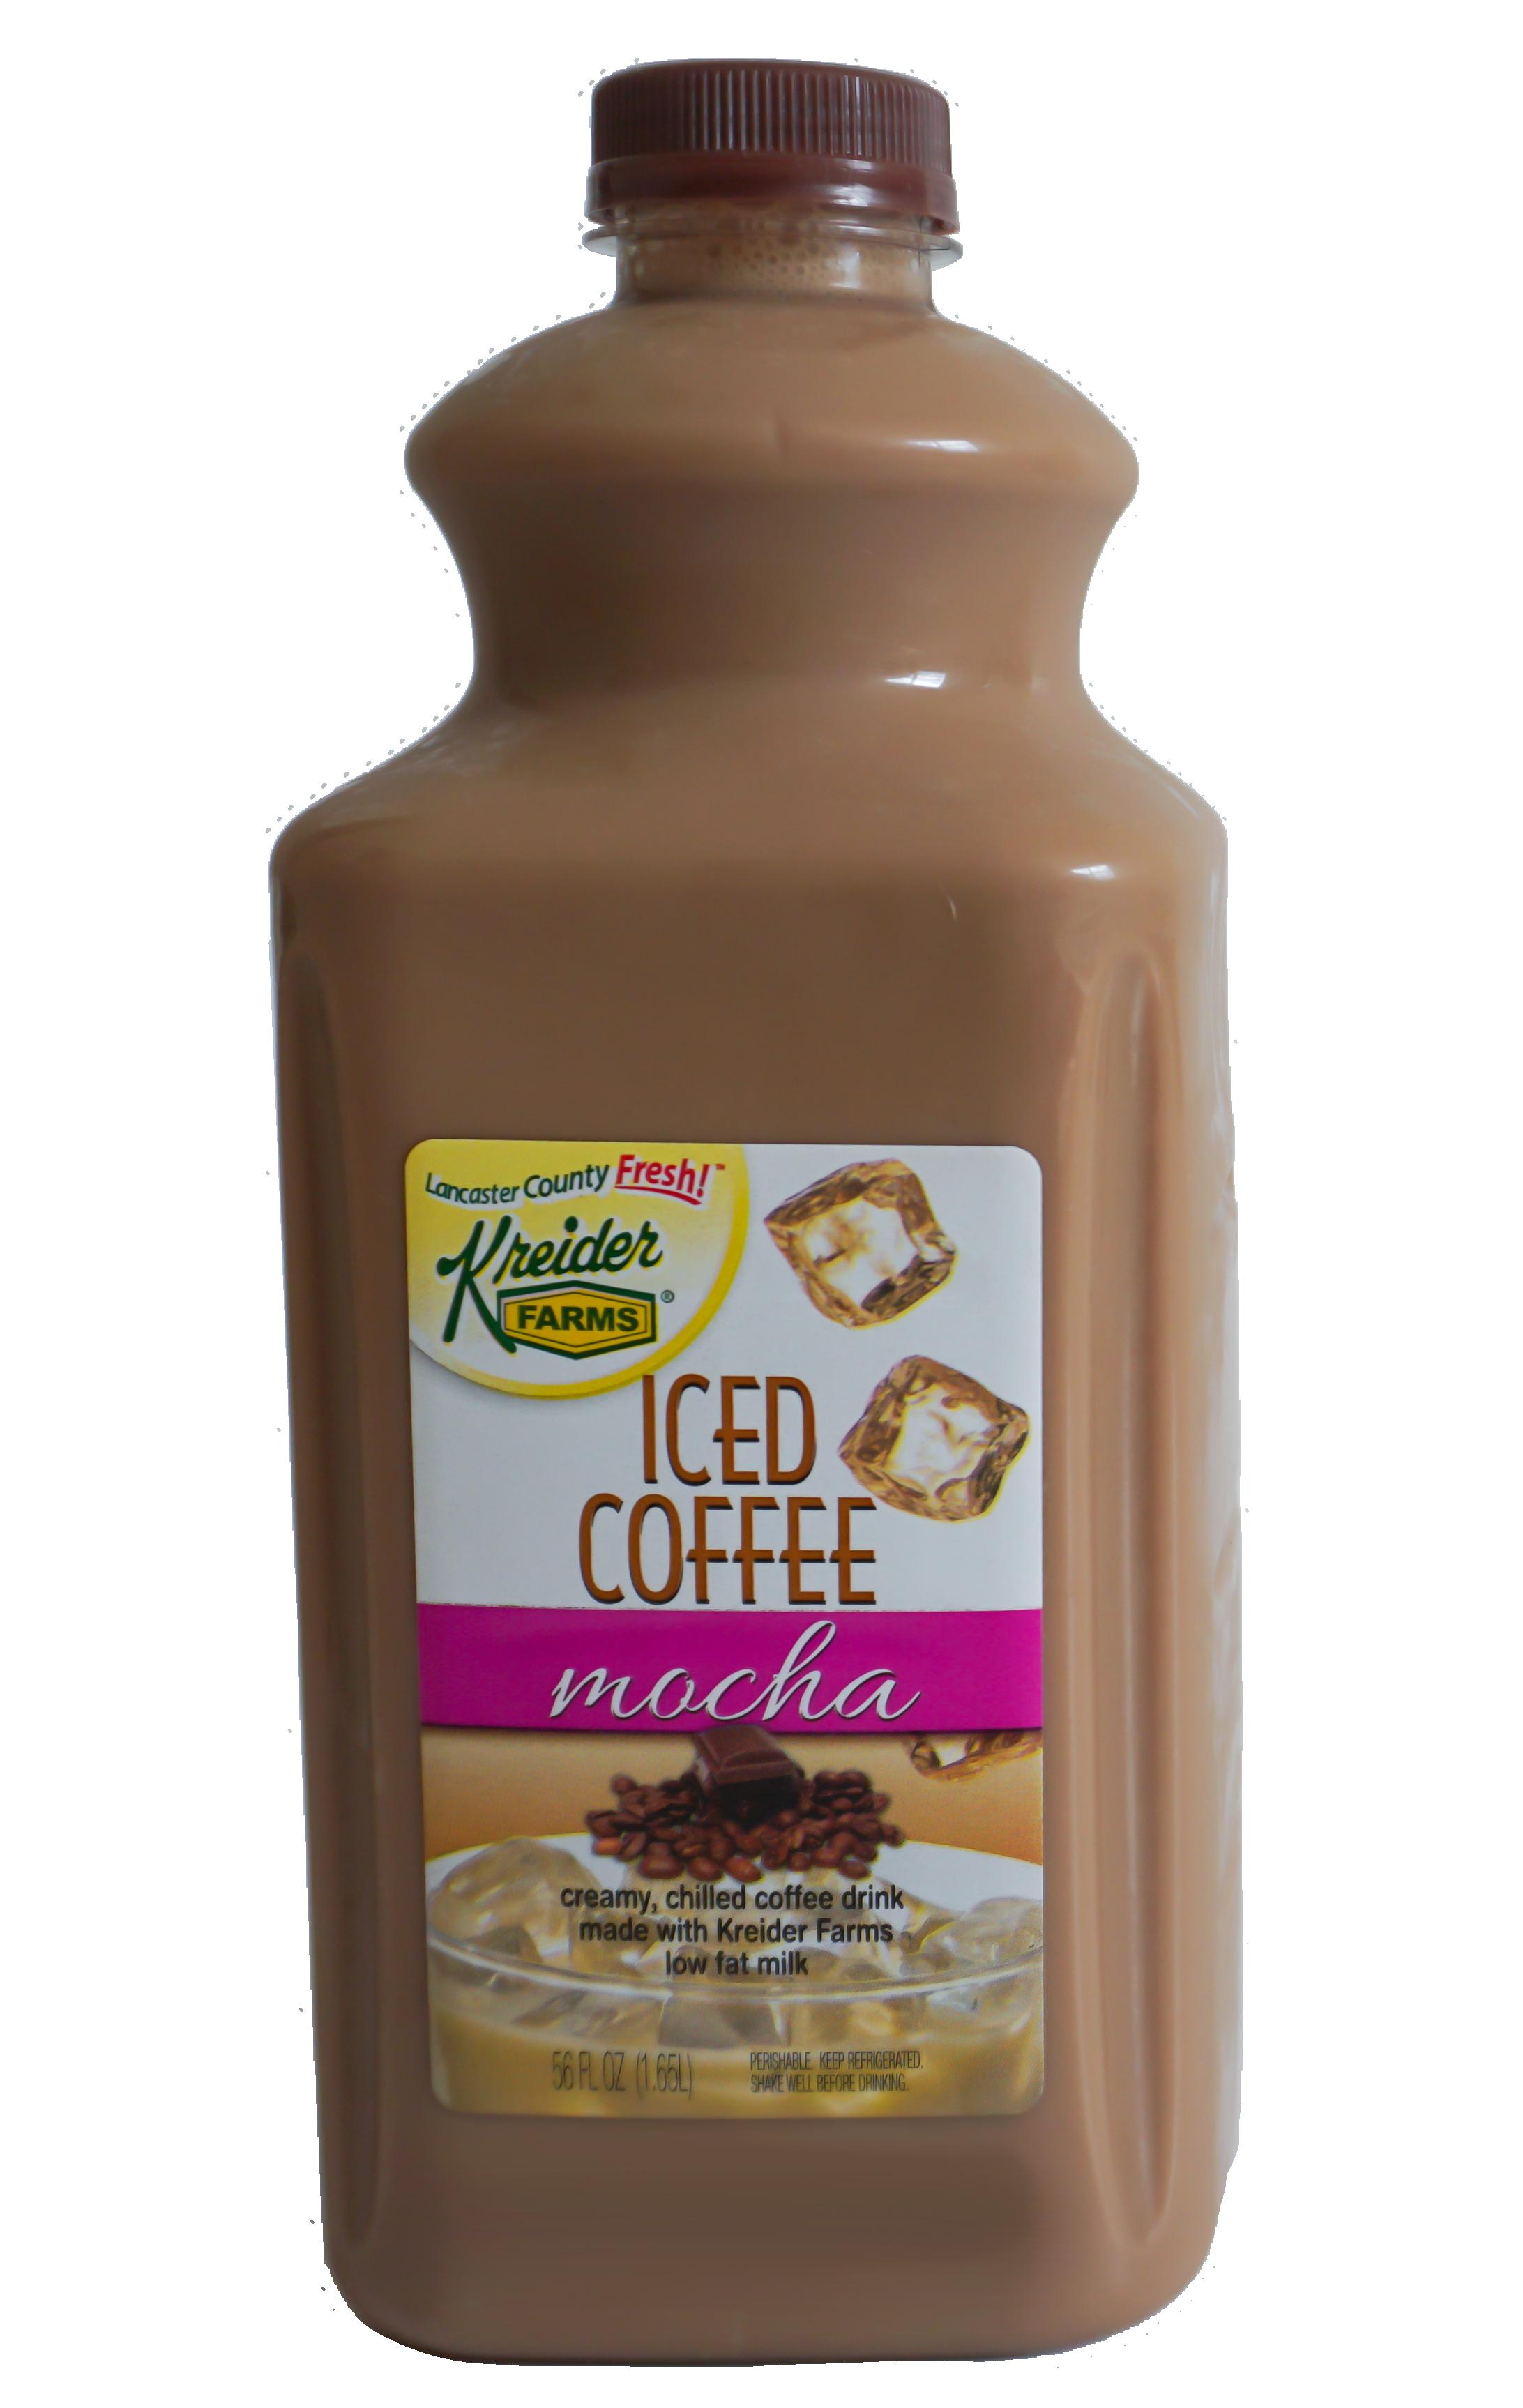 Save $0.50 on any 56oz of Kreider's Iced Coffee Mocha